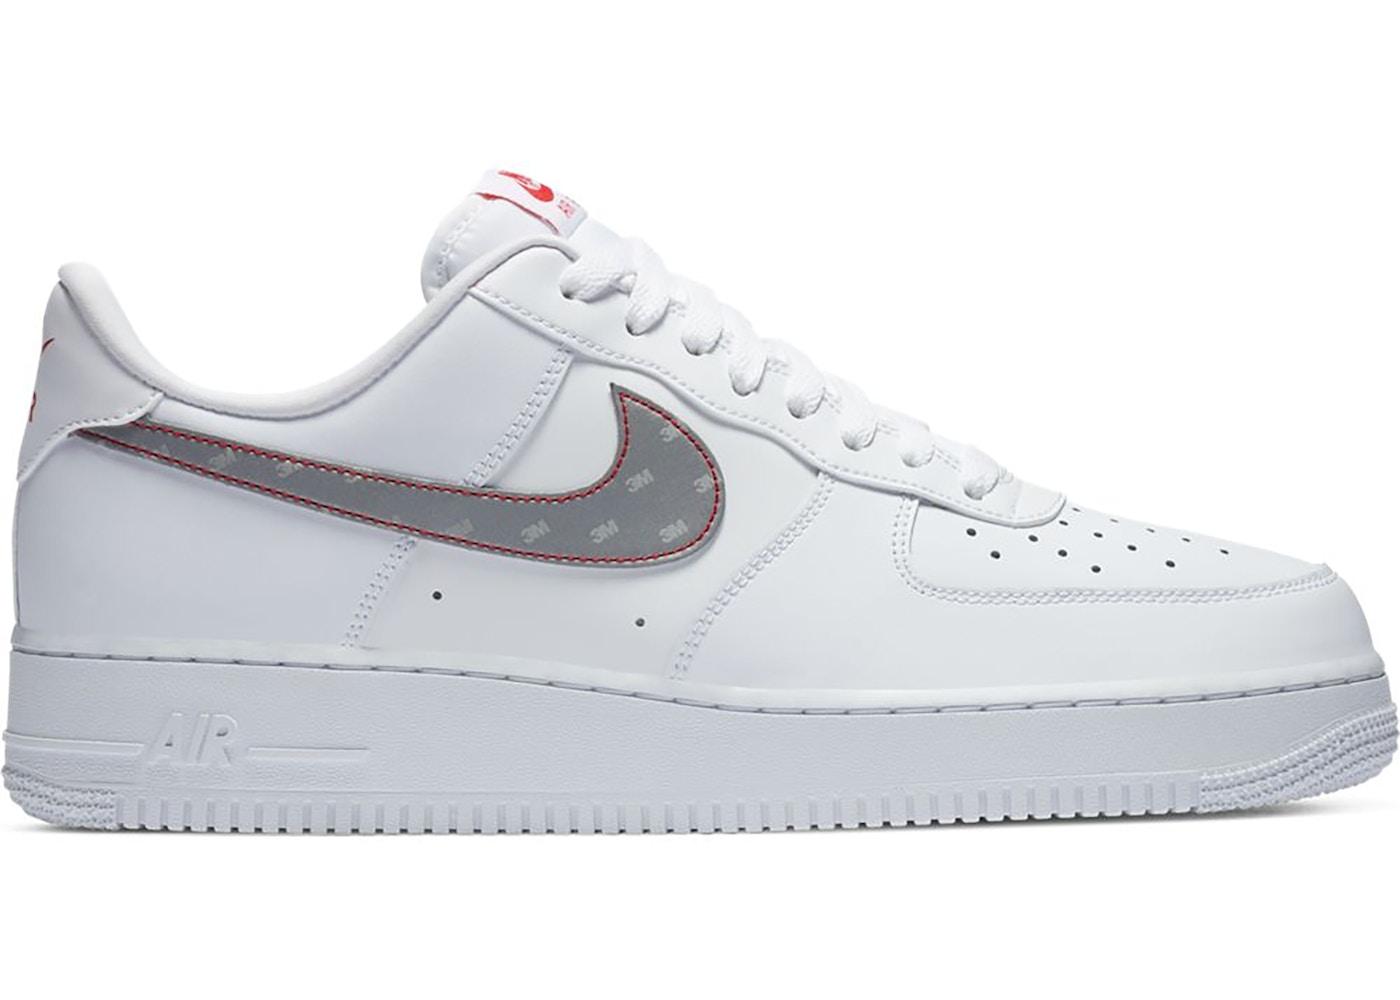 Nike Air Force 1 Low 3M Swoosh White